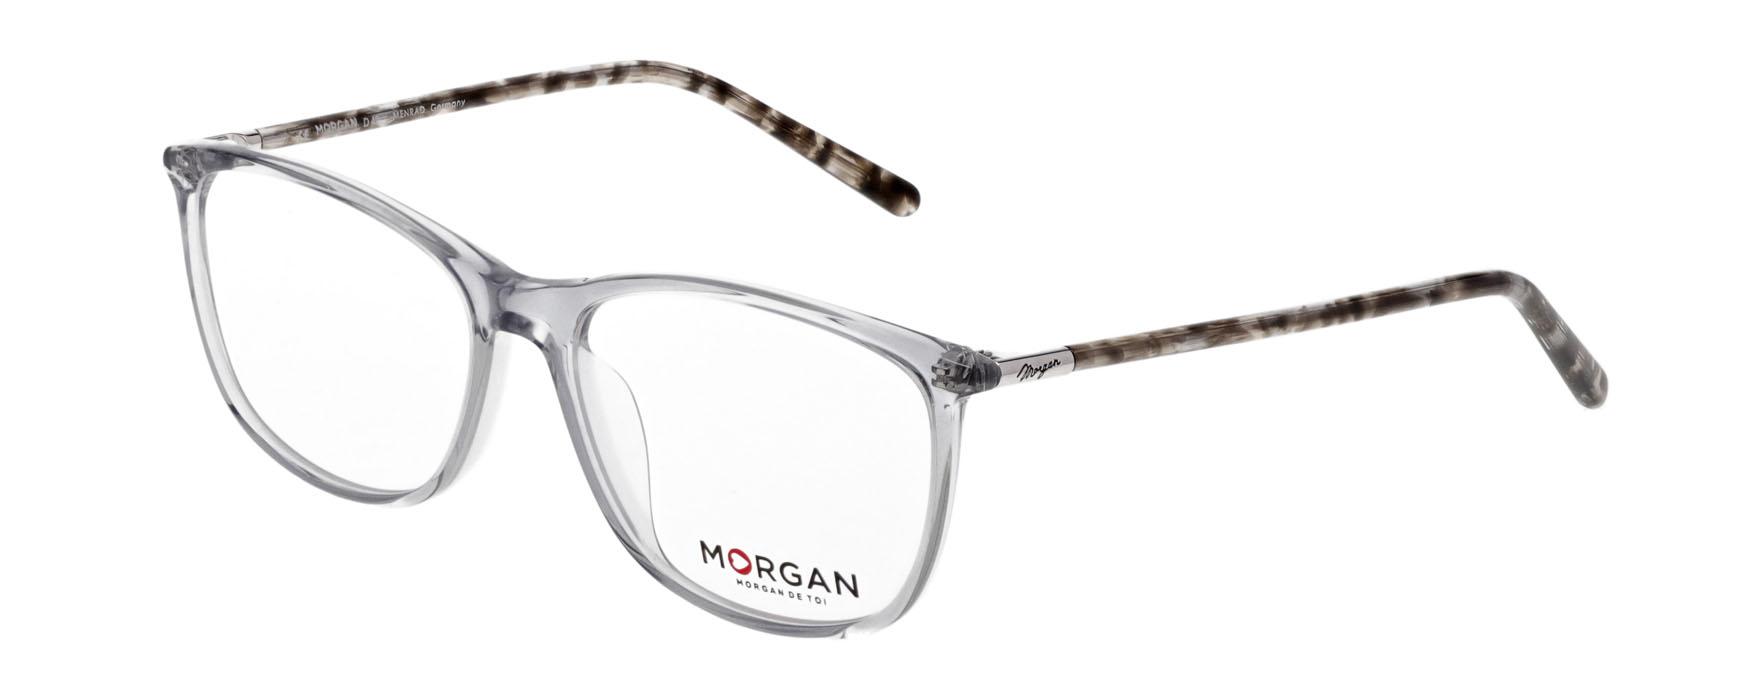 Morgan 202025 4803